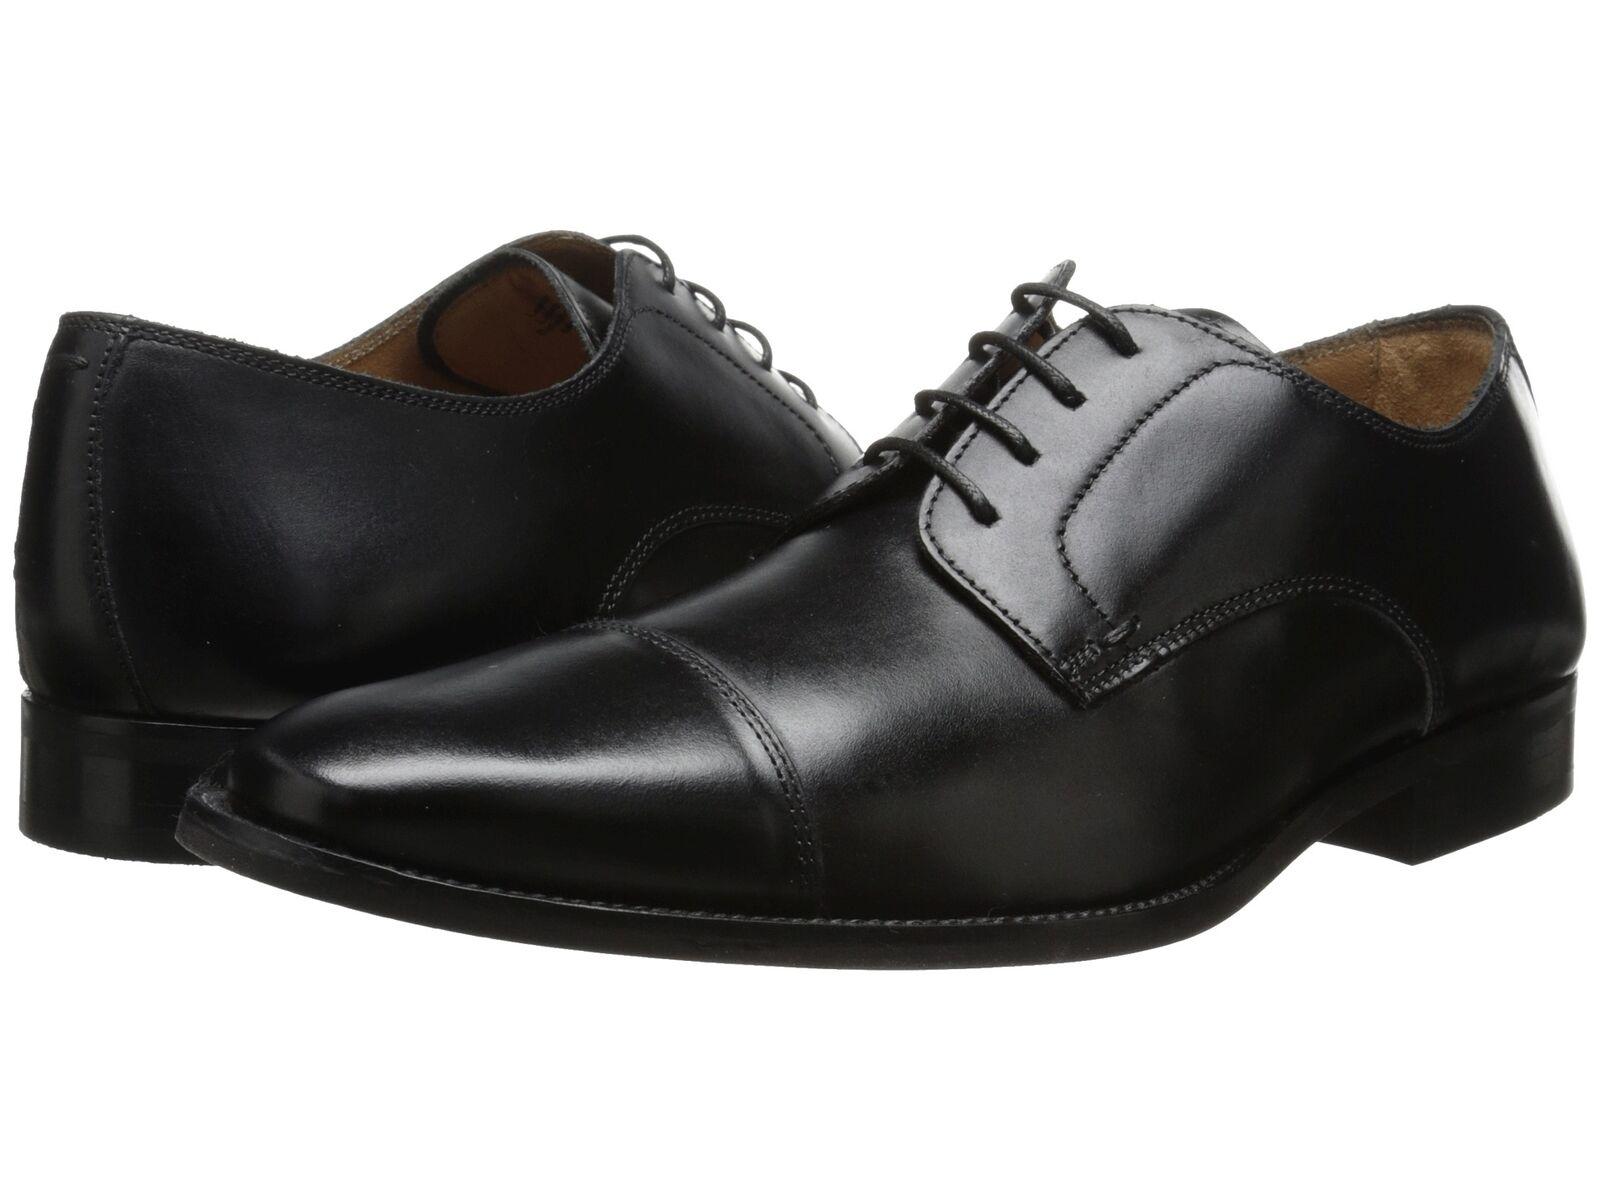 Homme Florsheim Sabato Cap Ox Noir Chaussures en cuir 12123-001